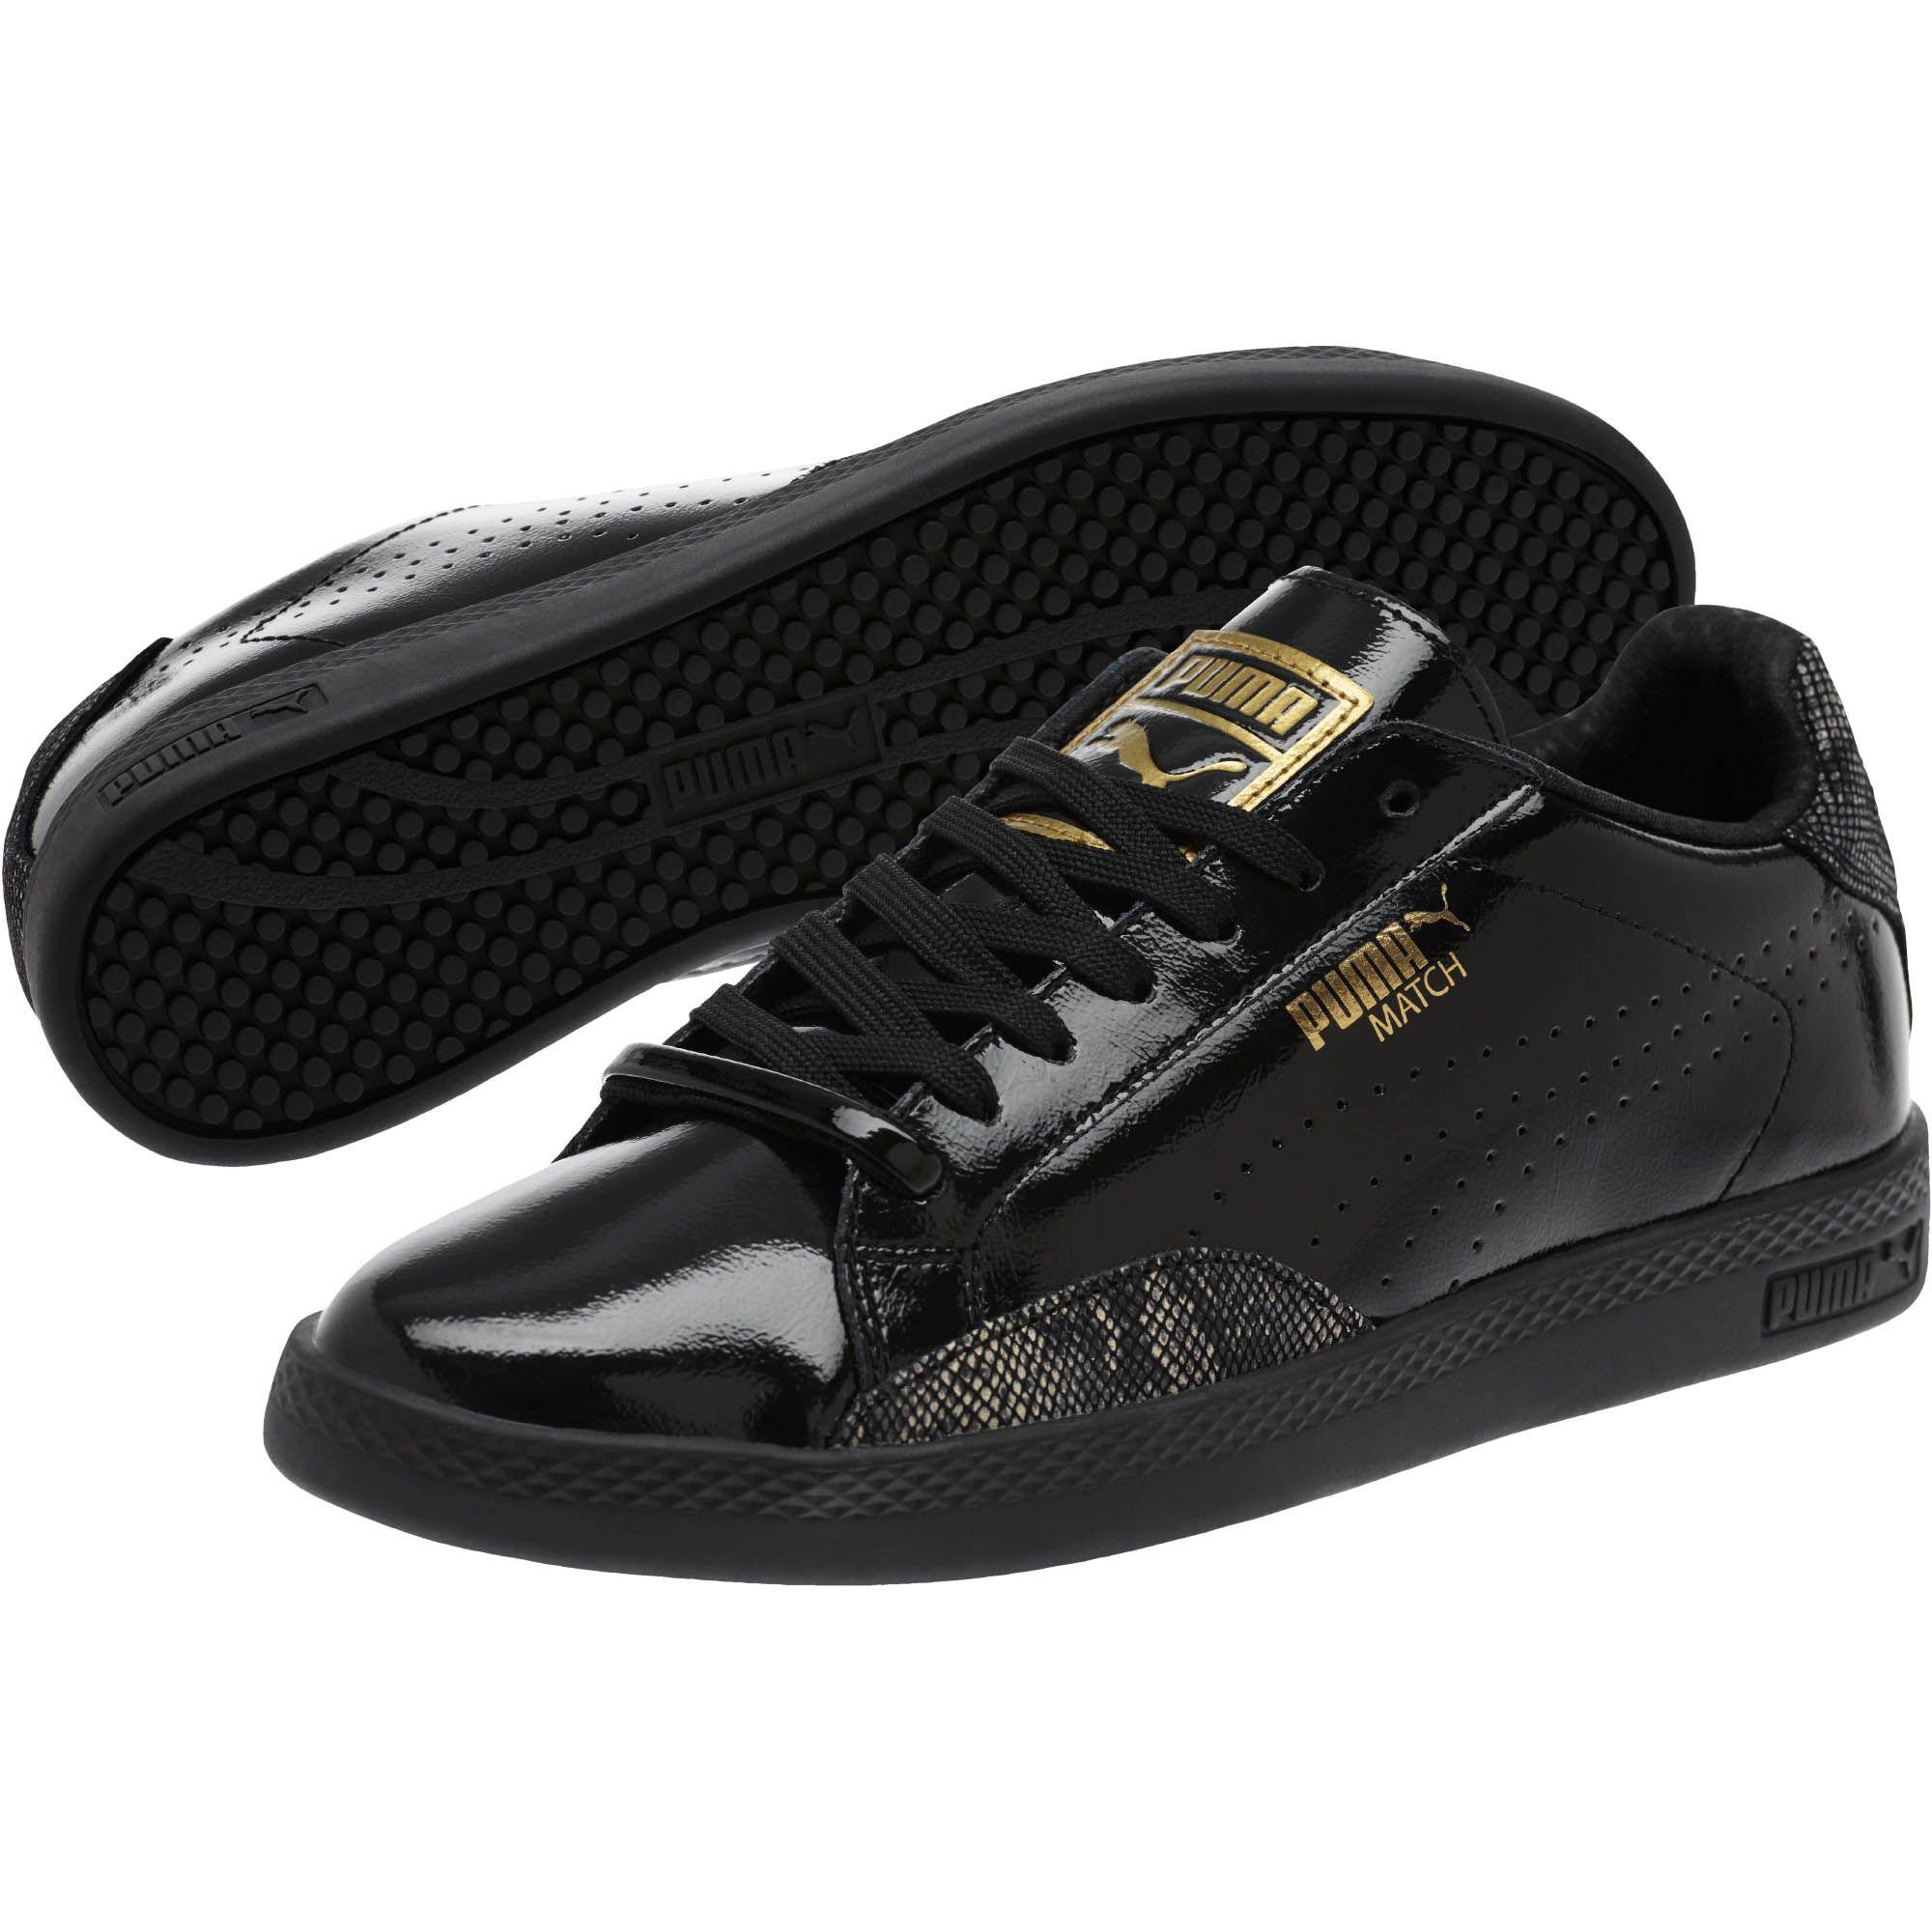 47563fef595 Lyst - PUMA Match Lo Patent Snake Women s Sneakers